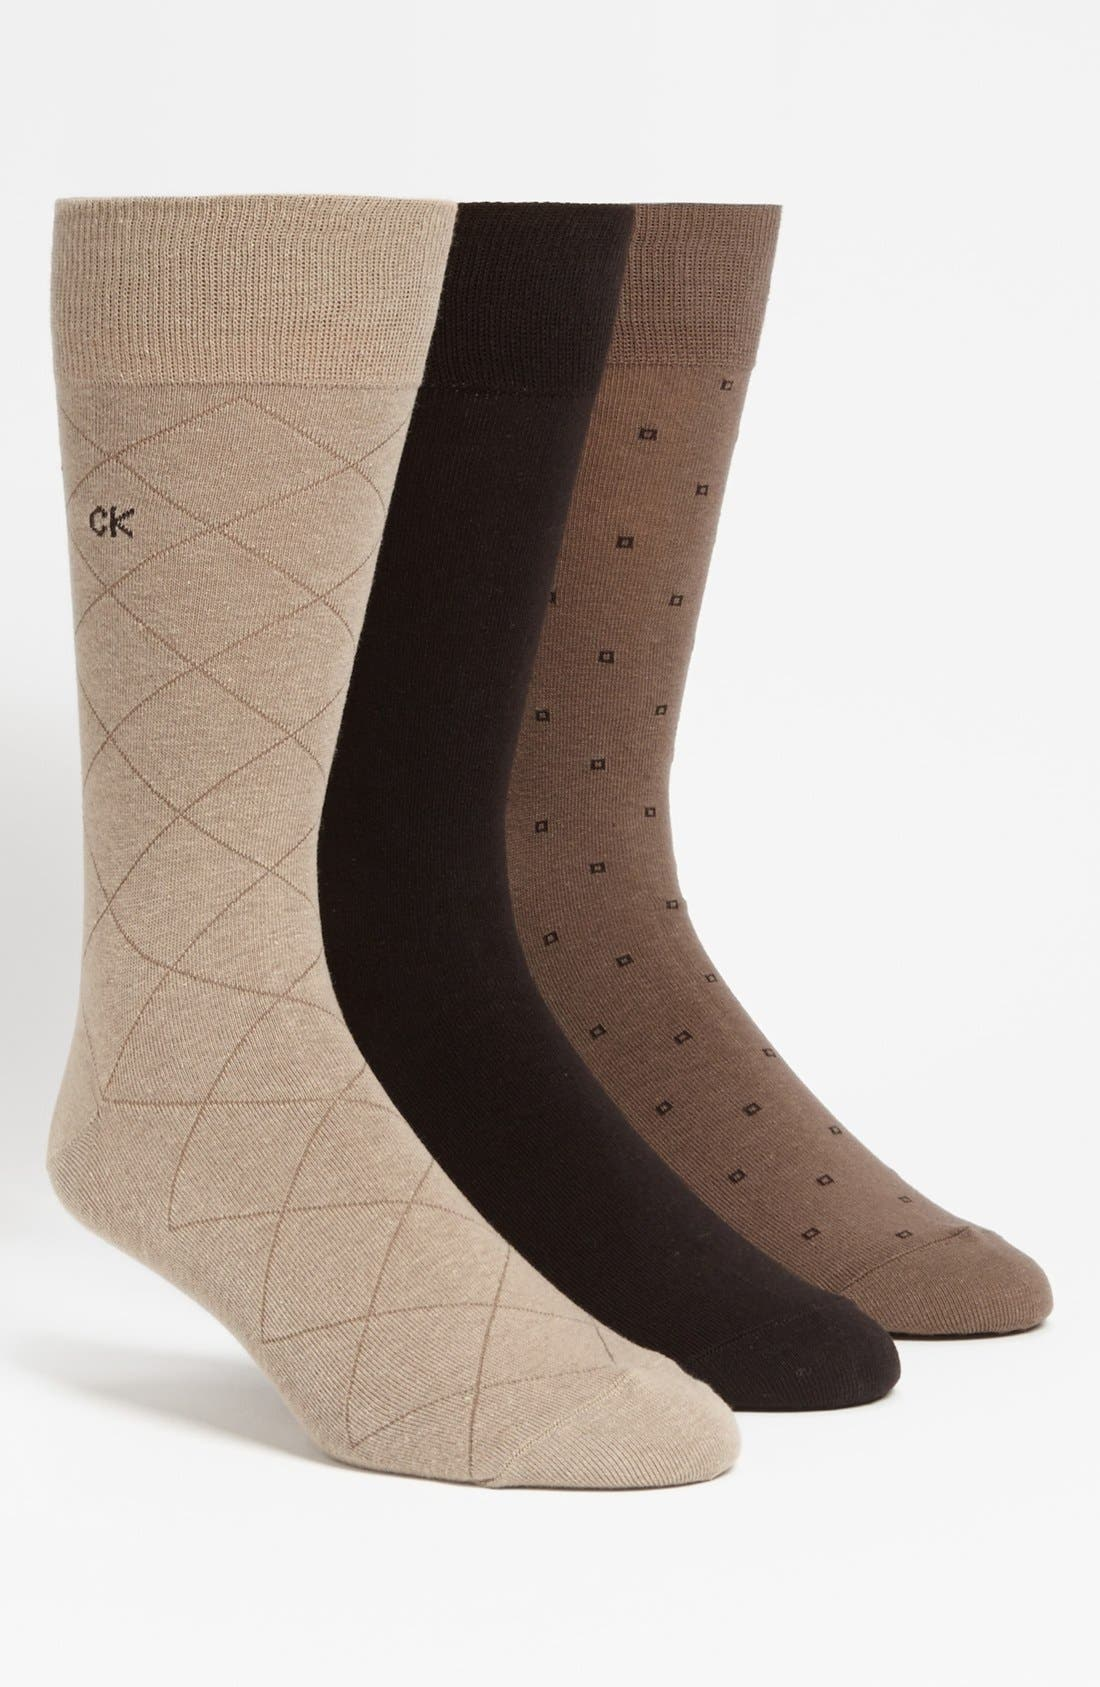 Alternate Image 1 Selected - Calvin Klein 3-Pack Patterned Socks